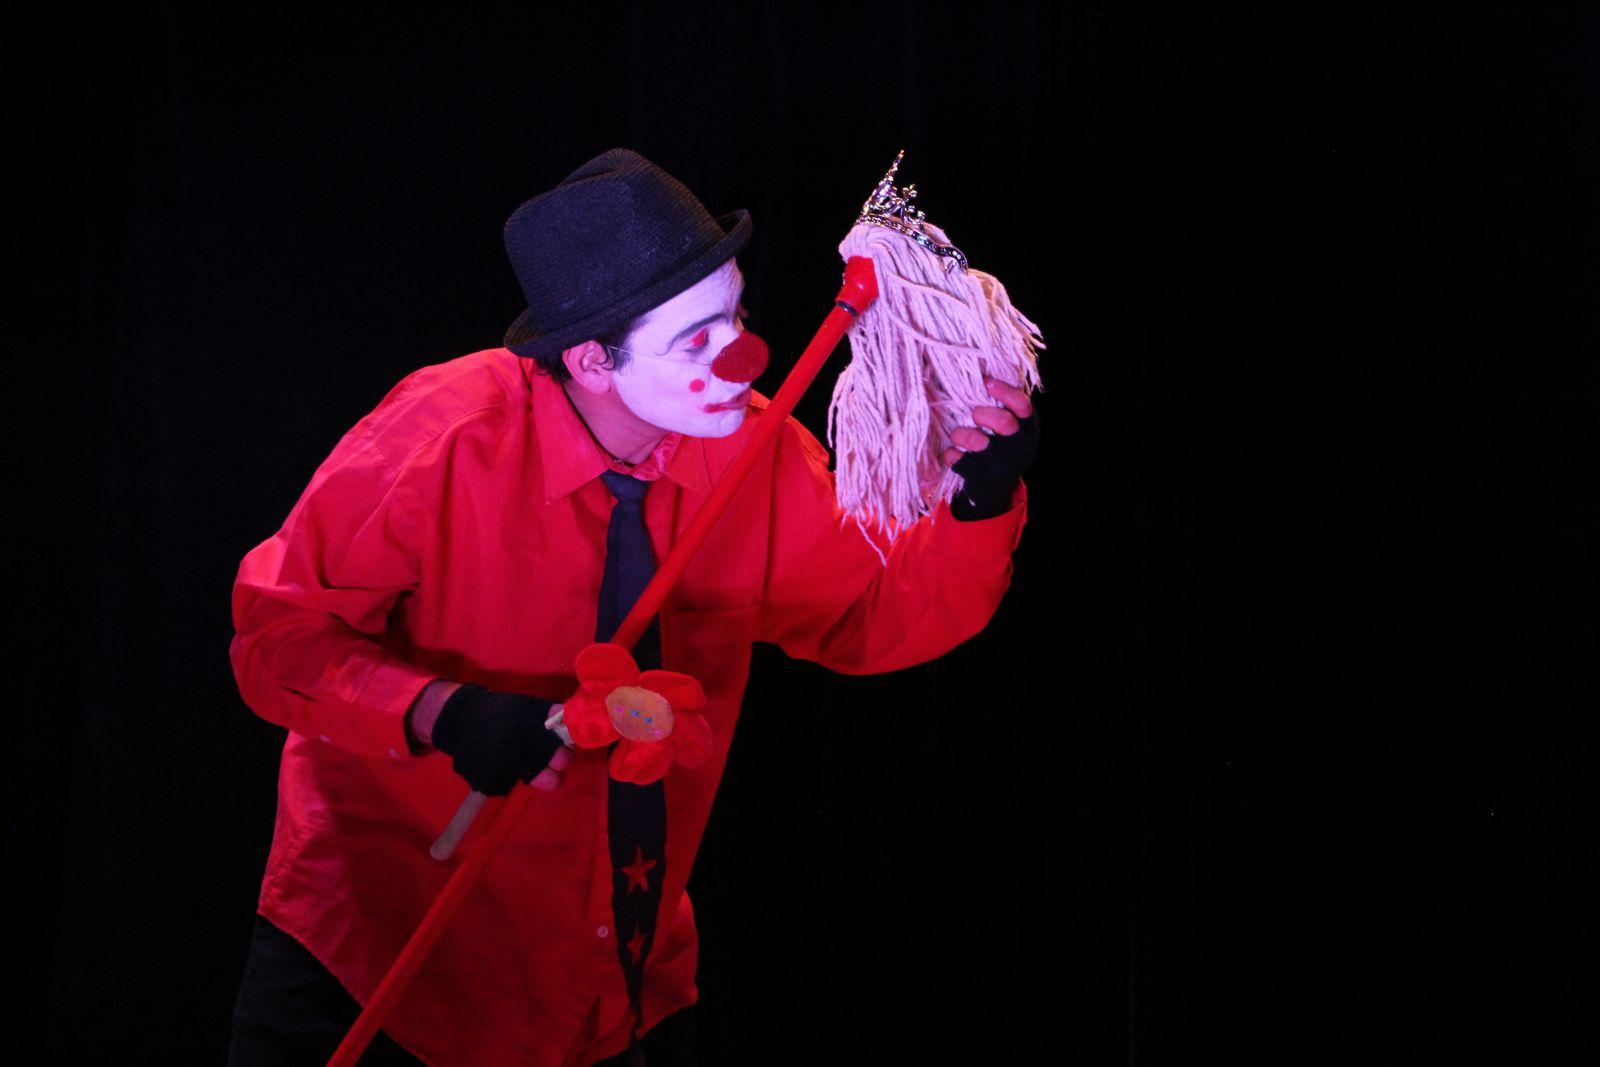 EVENTO 2 Divertimento clown